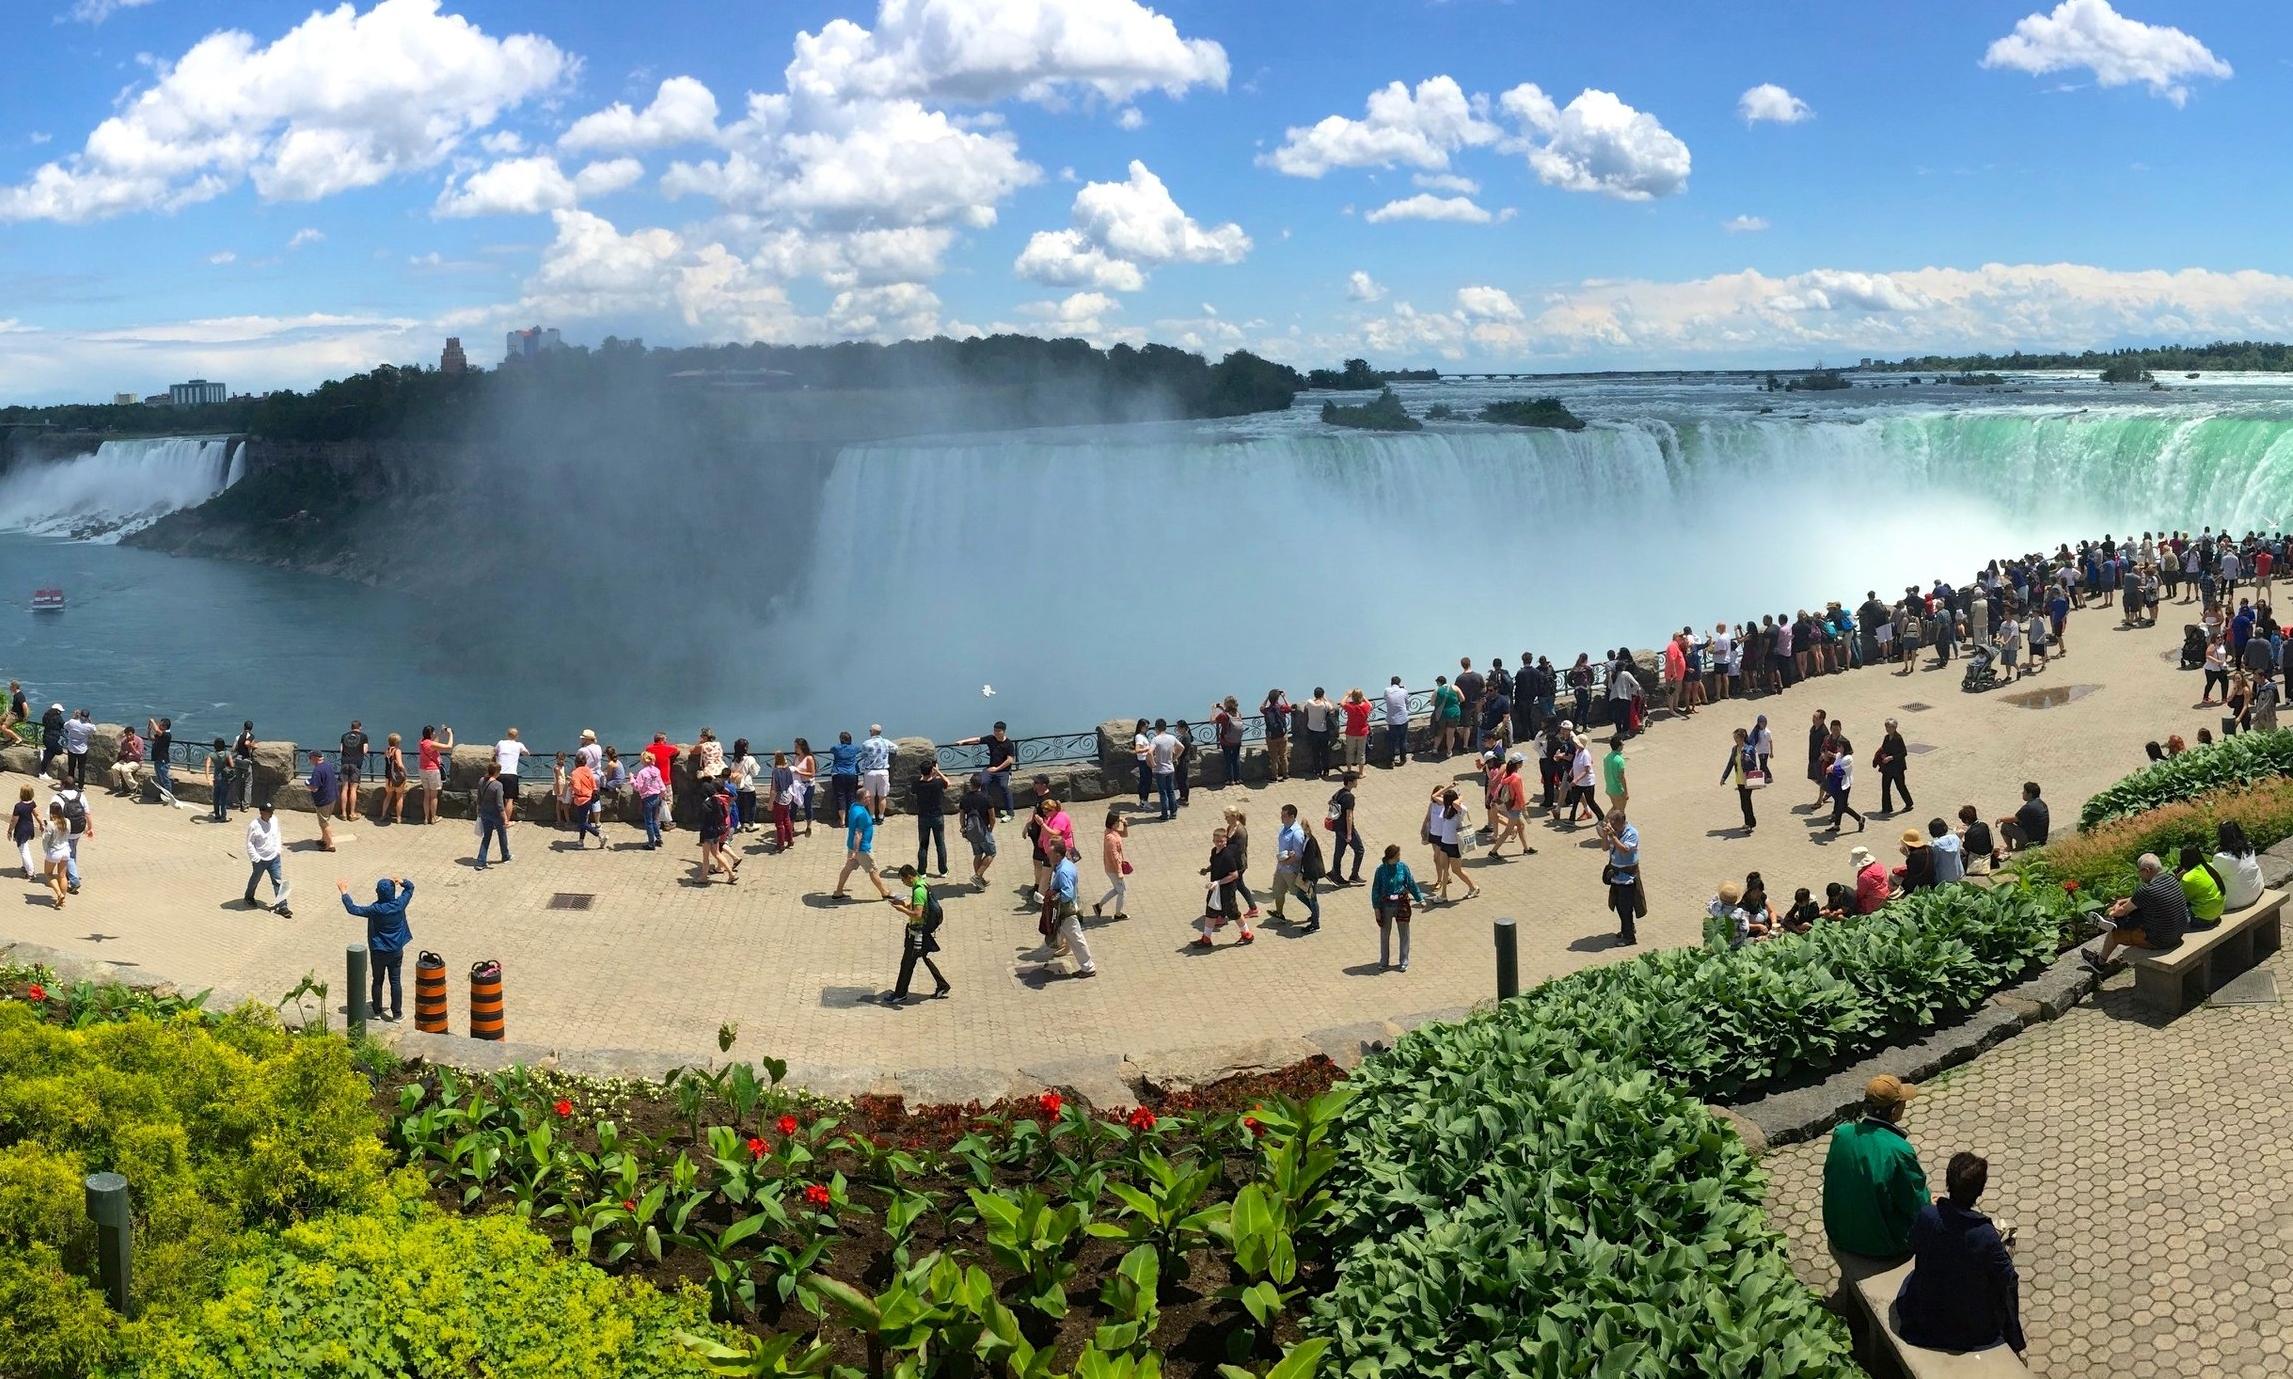 6/Niagara Falls, New York